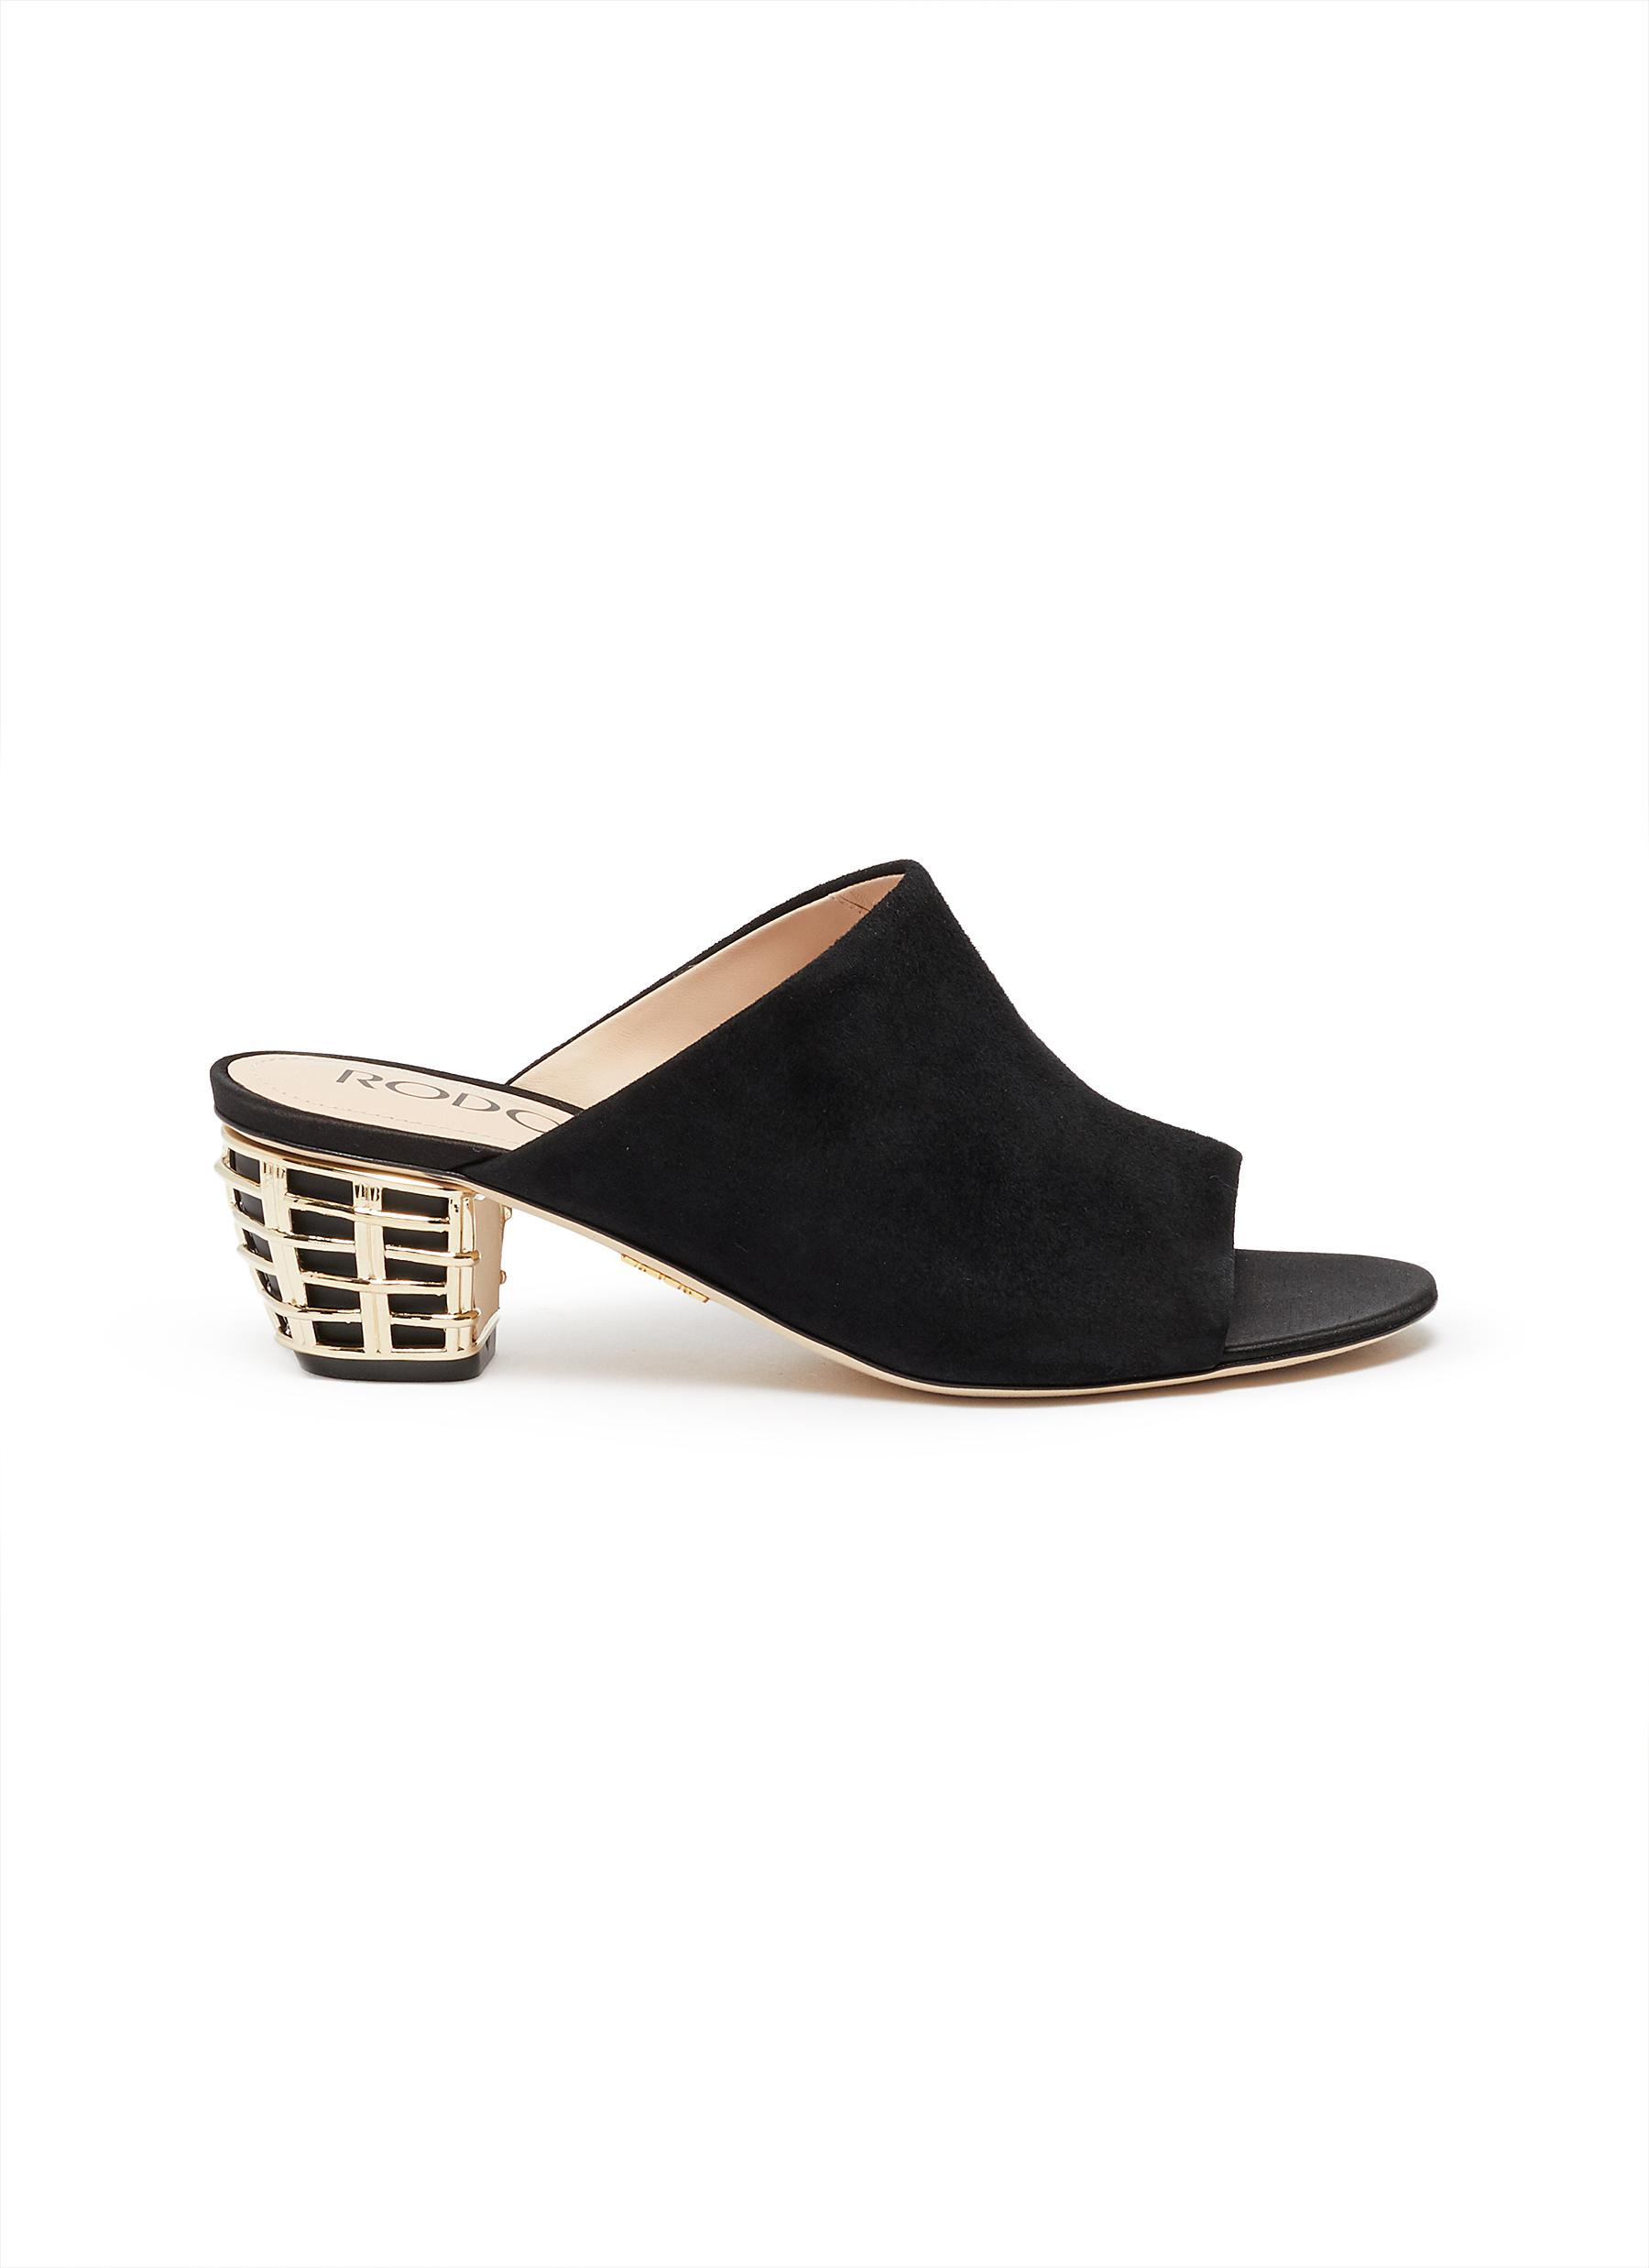 Metallic heel suede mules by Rodo